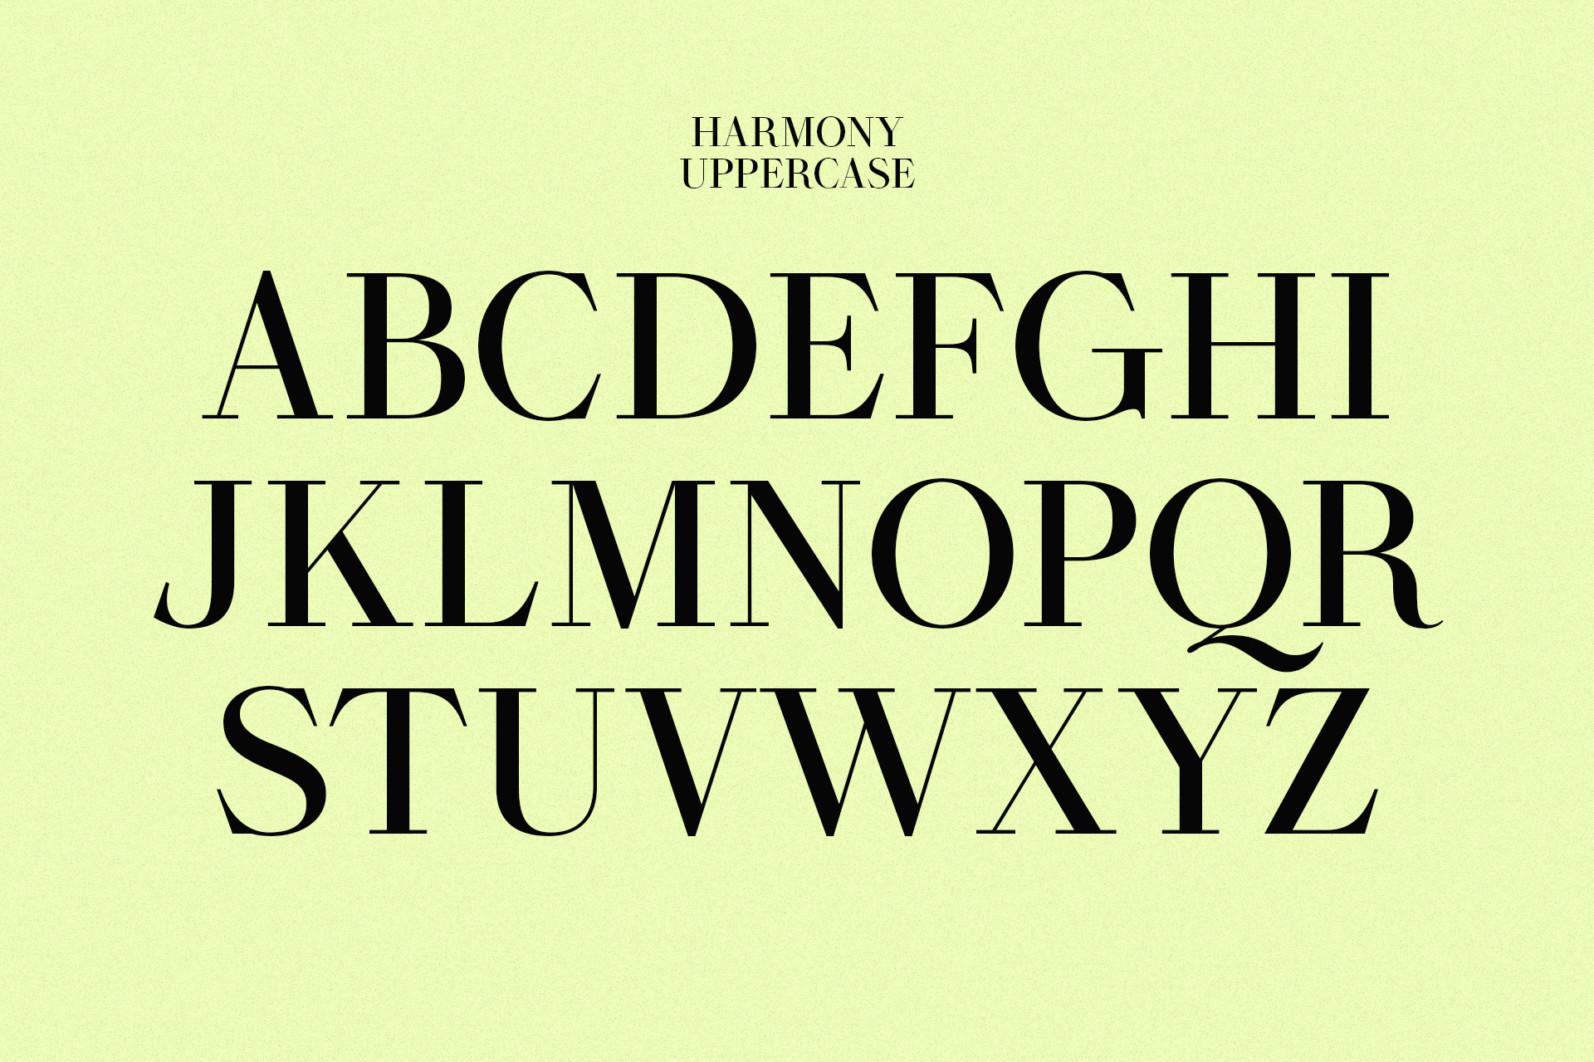 HARMONY - Harmony preview 2 -